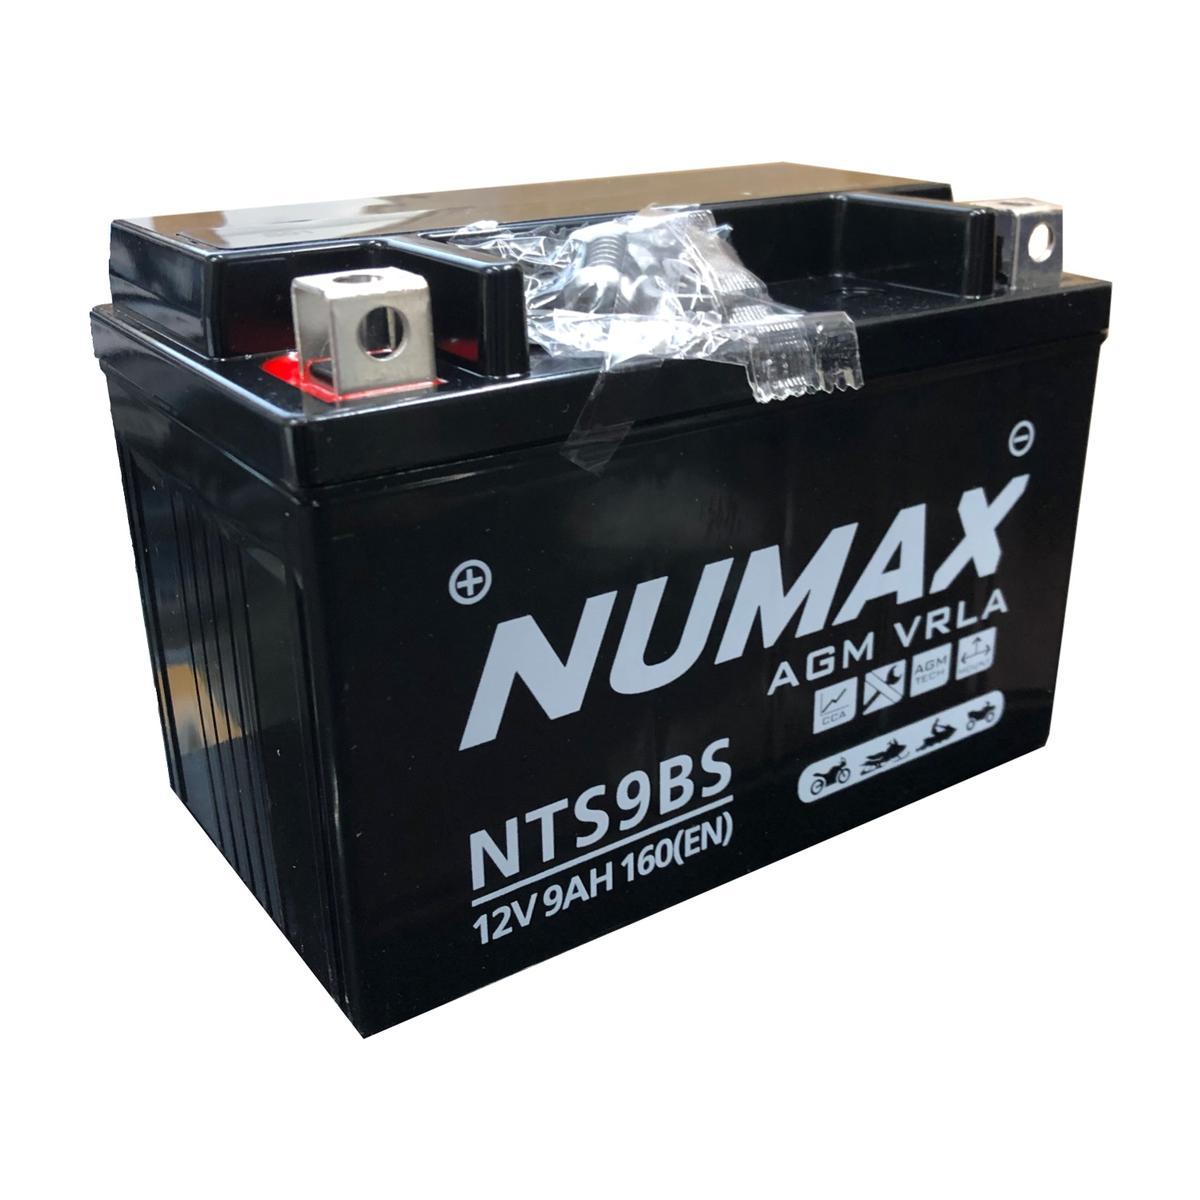 Numax NTS9BS 12v Motorbike Bike Battery KYMCO 150cc B&W YXT9-4